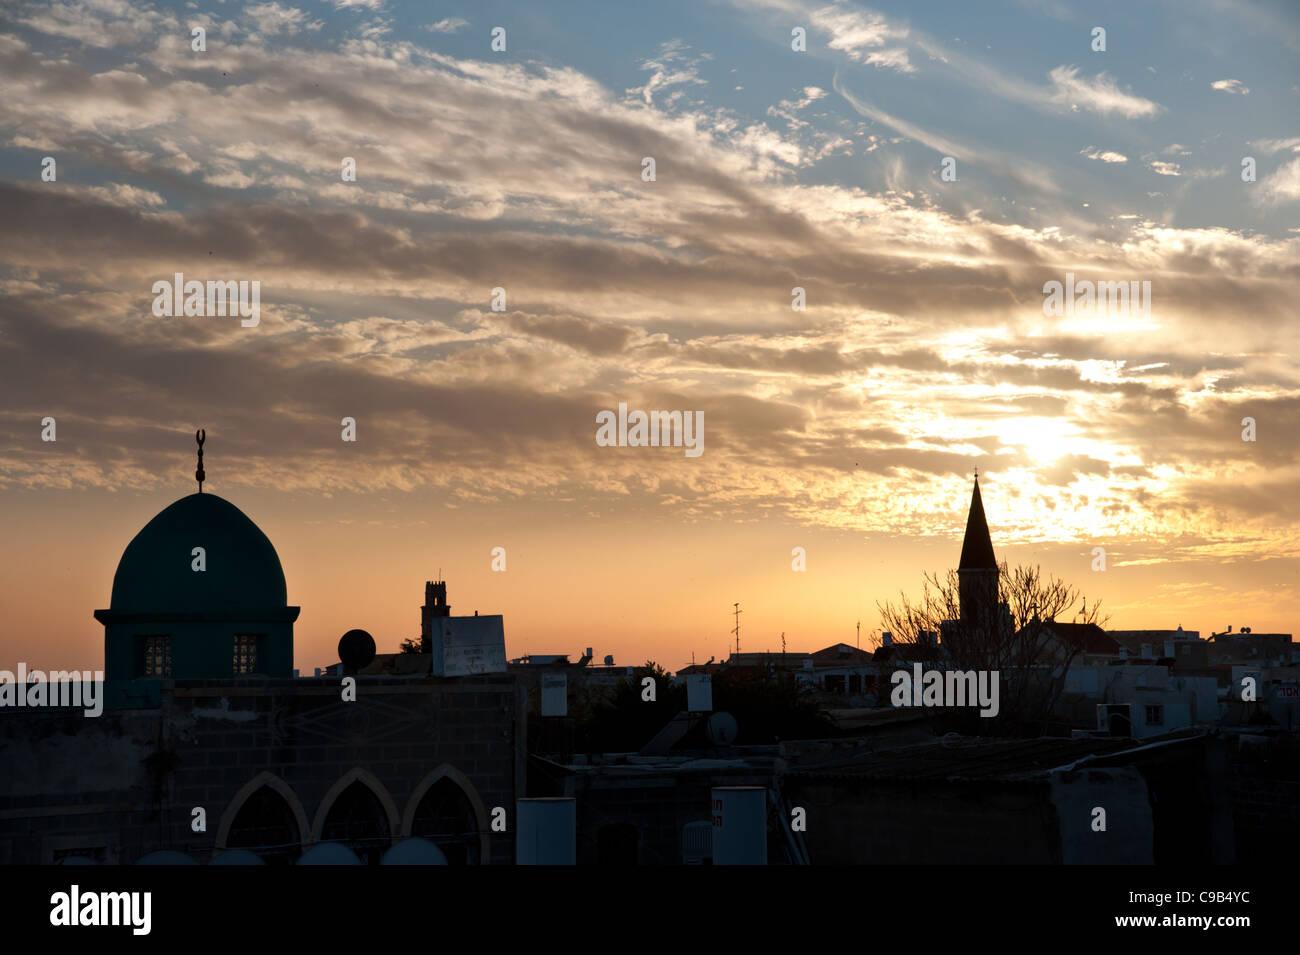 Clochers, dômes et minarets le puncutate Akko (Acre), Israël, Skyline at sunset. Photo Stock